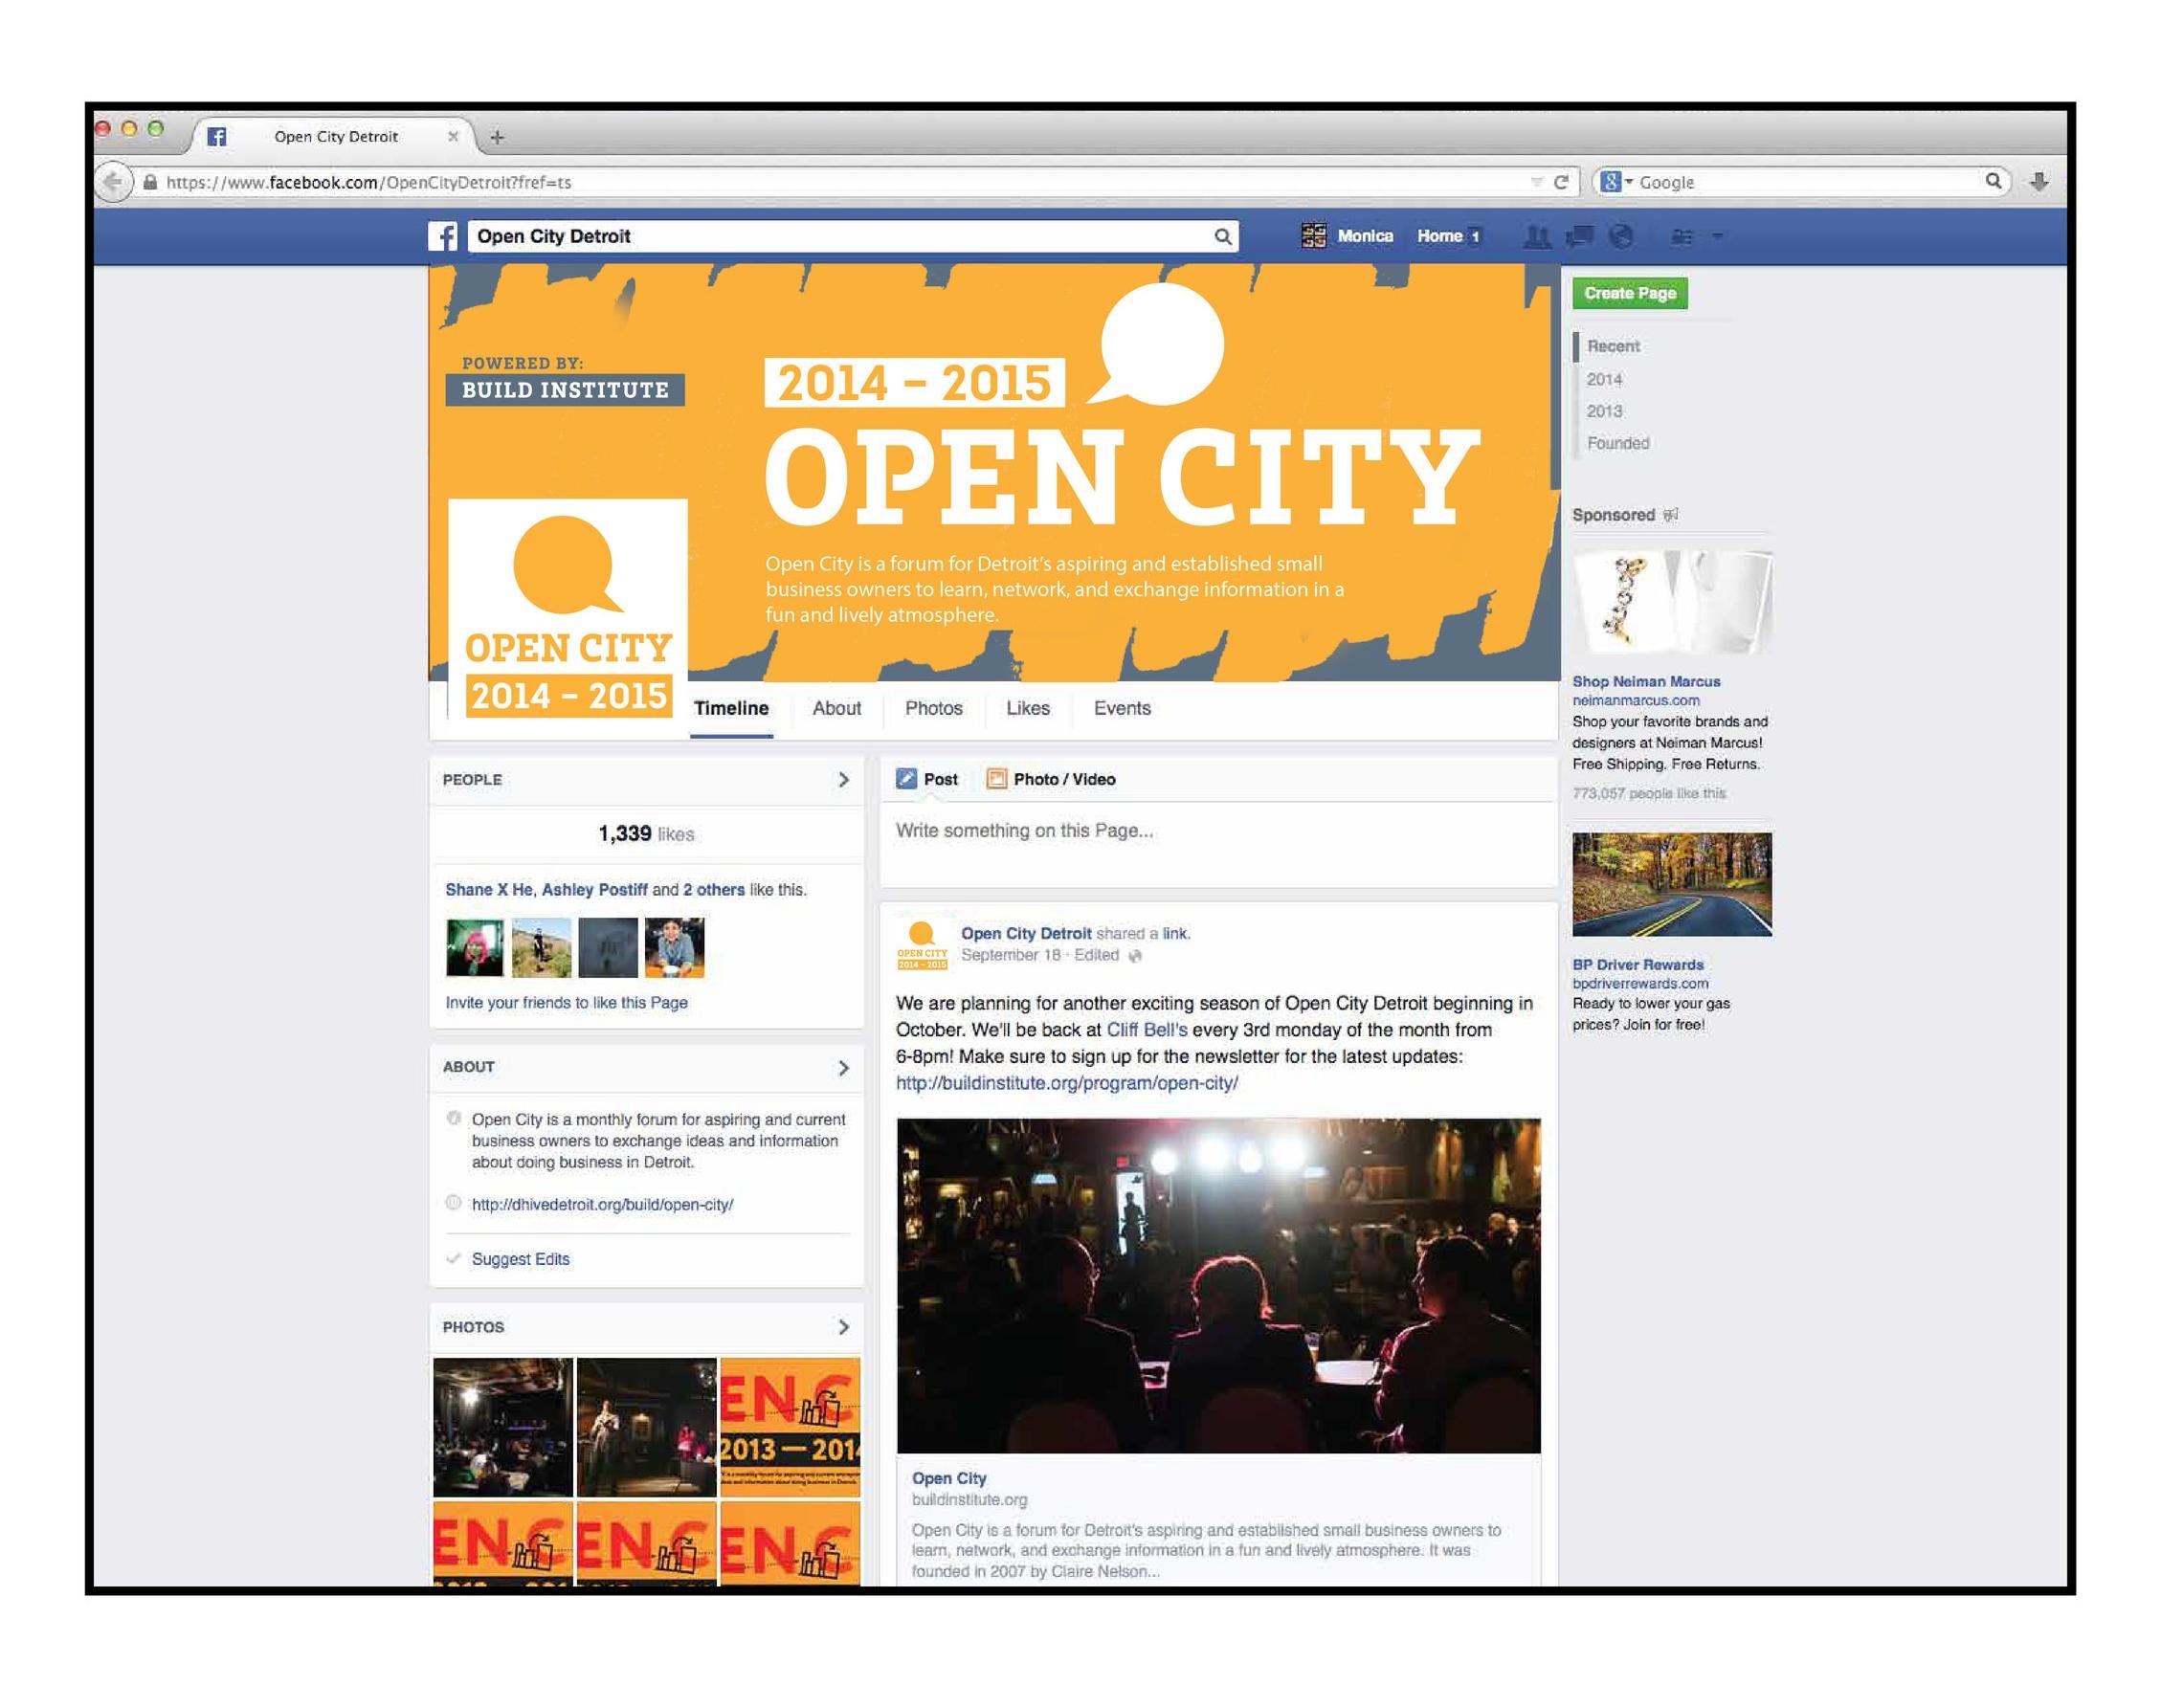 OpenCity-Facebook-01.jpg